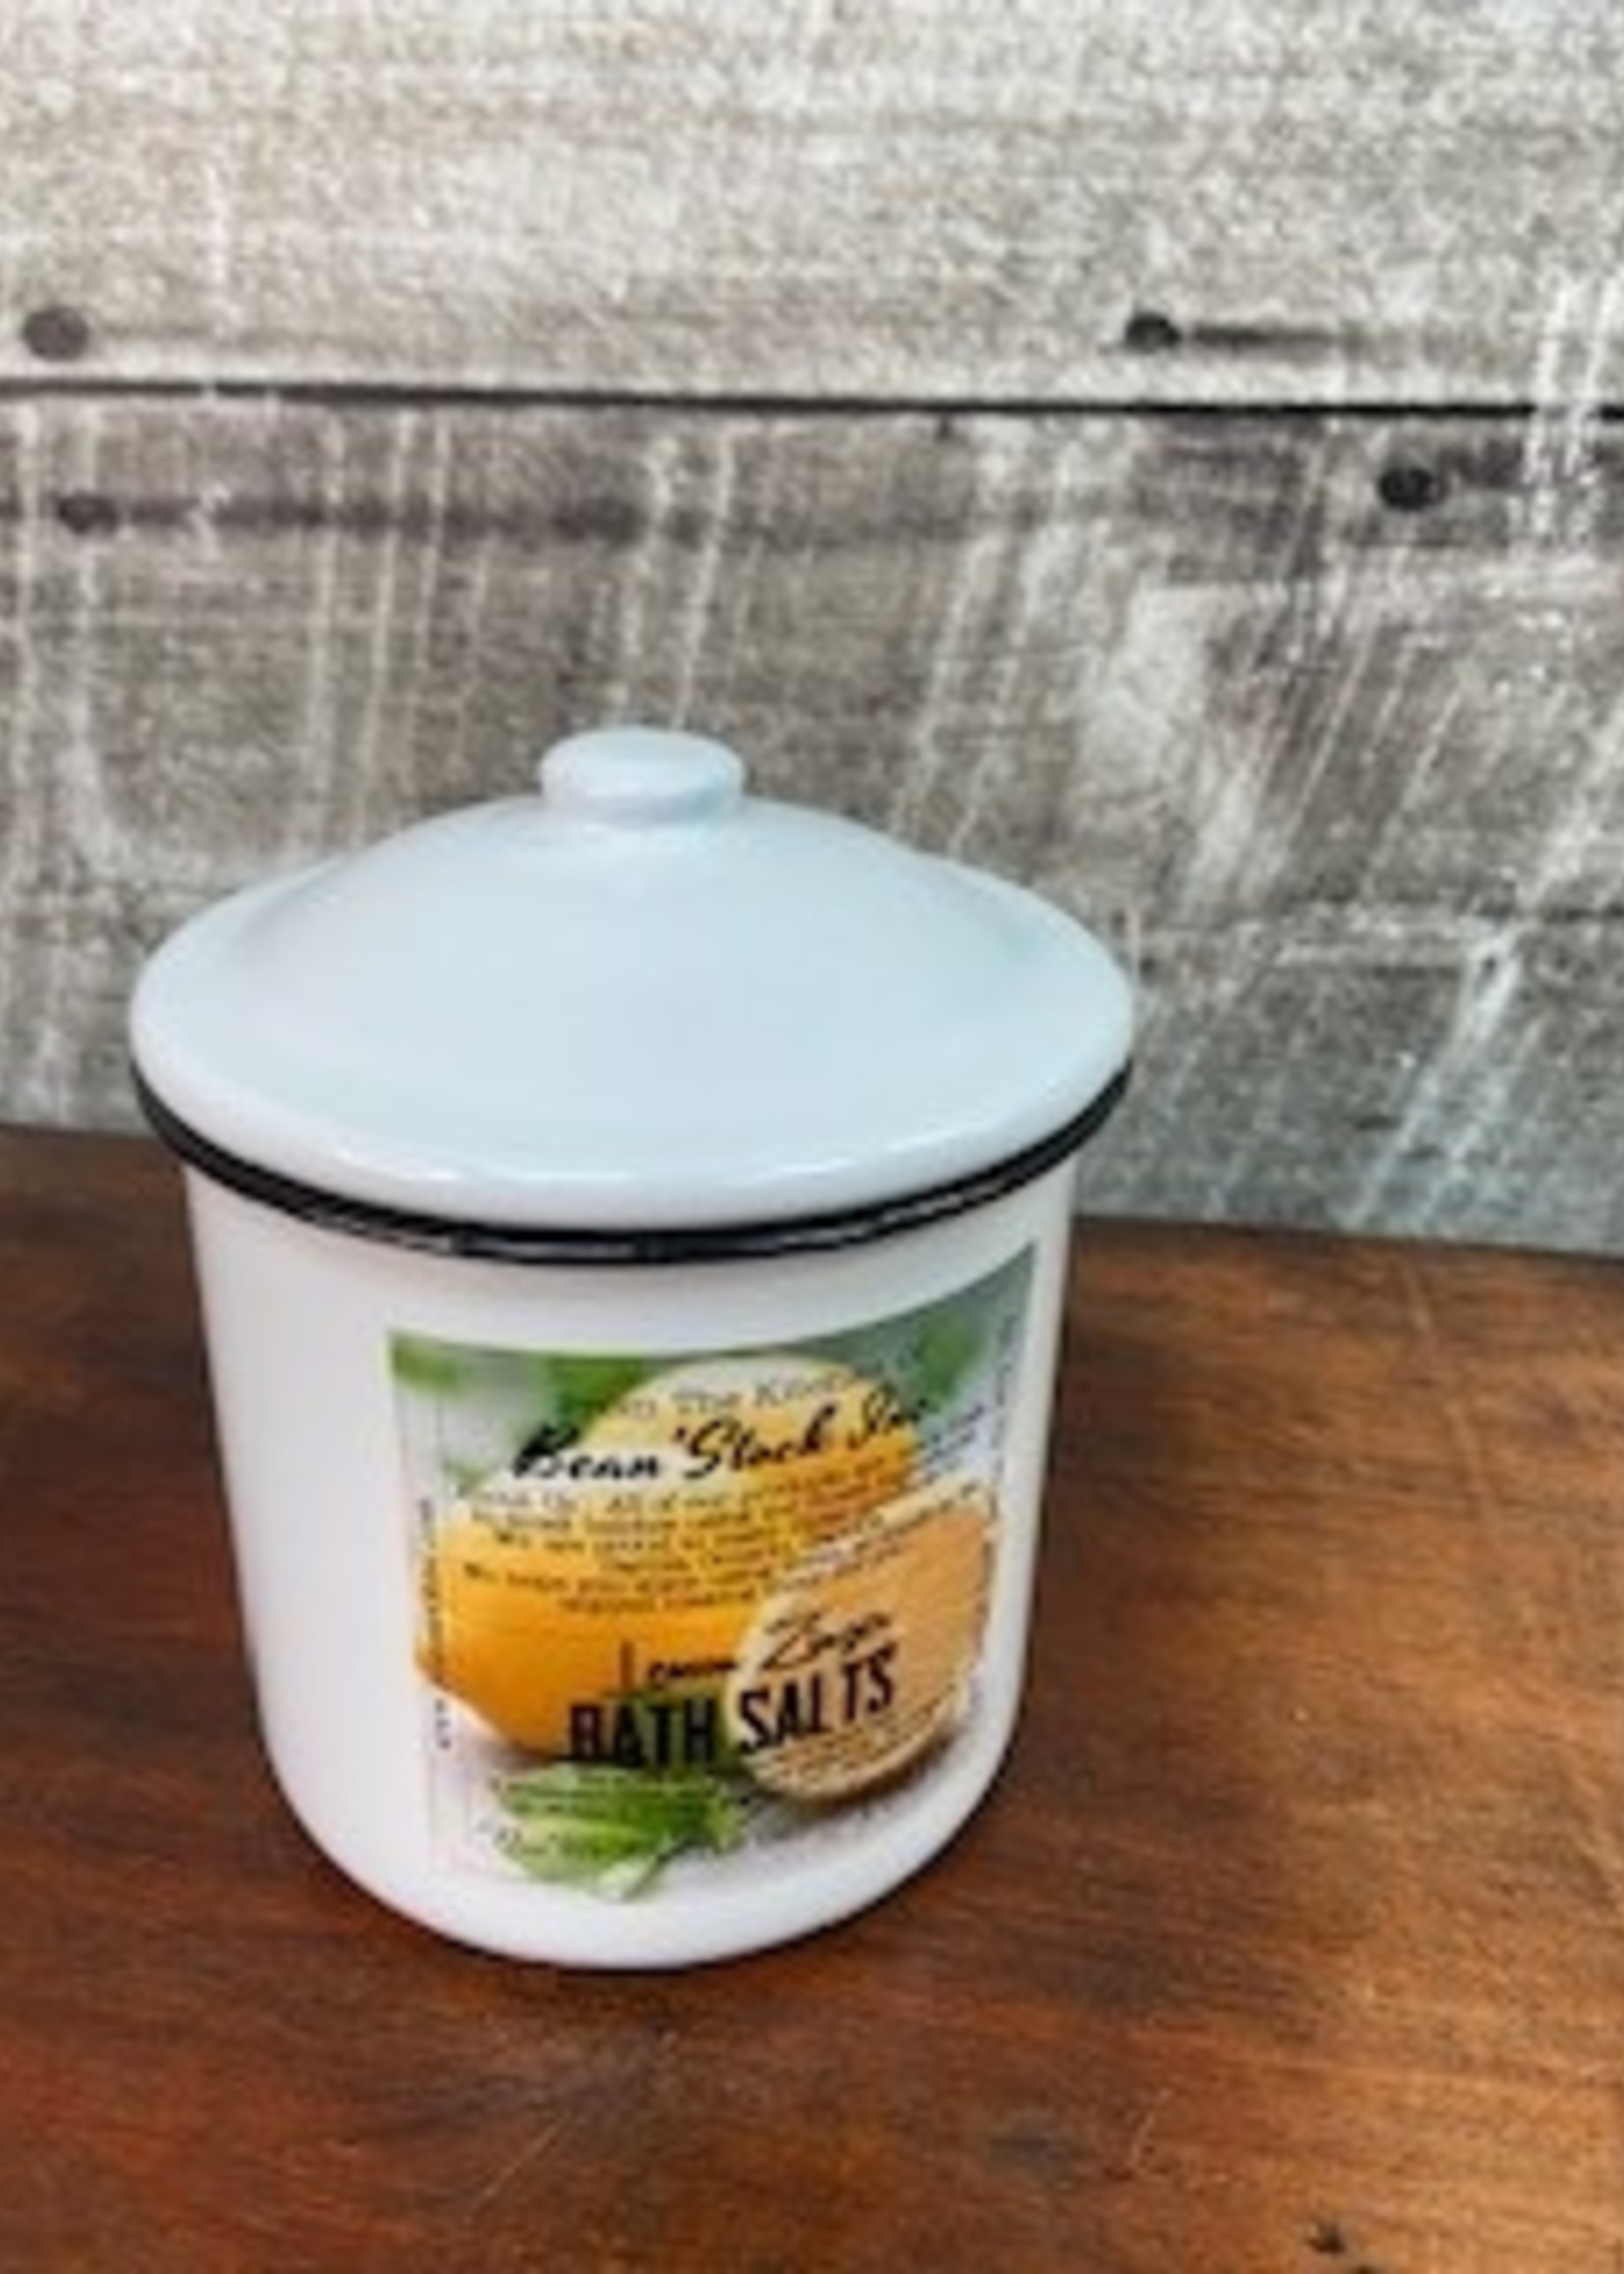 Bean stock Bath Salts in Enamelware - Lemon Zinger